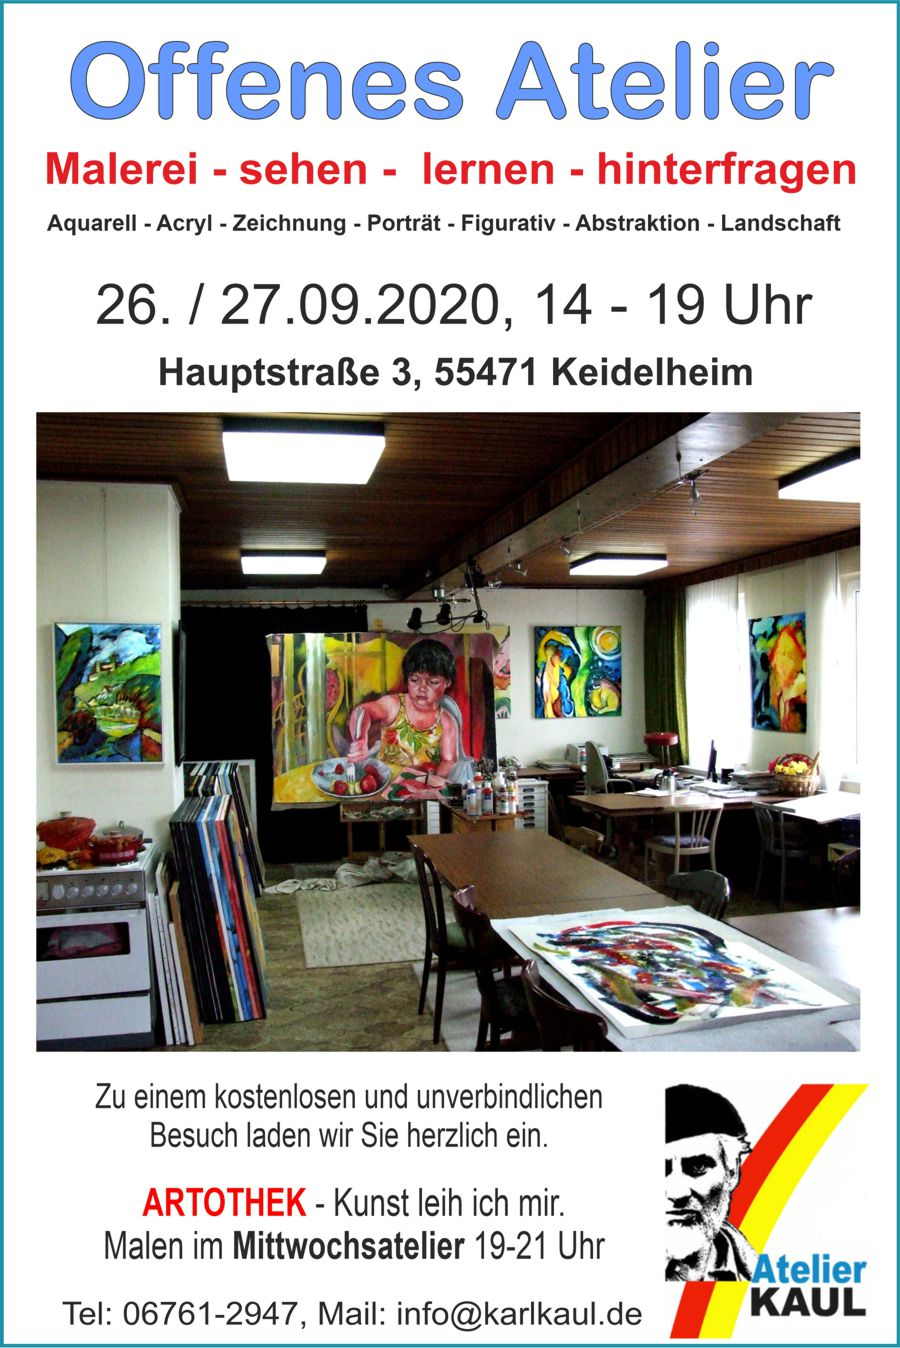 Offenes Atelier Karl Kaul 2020